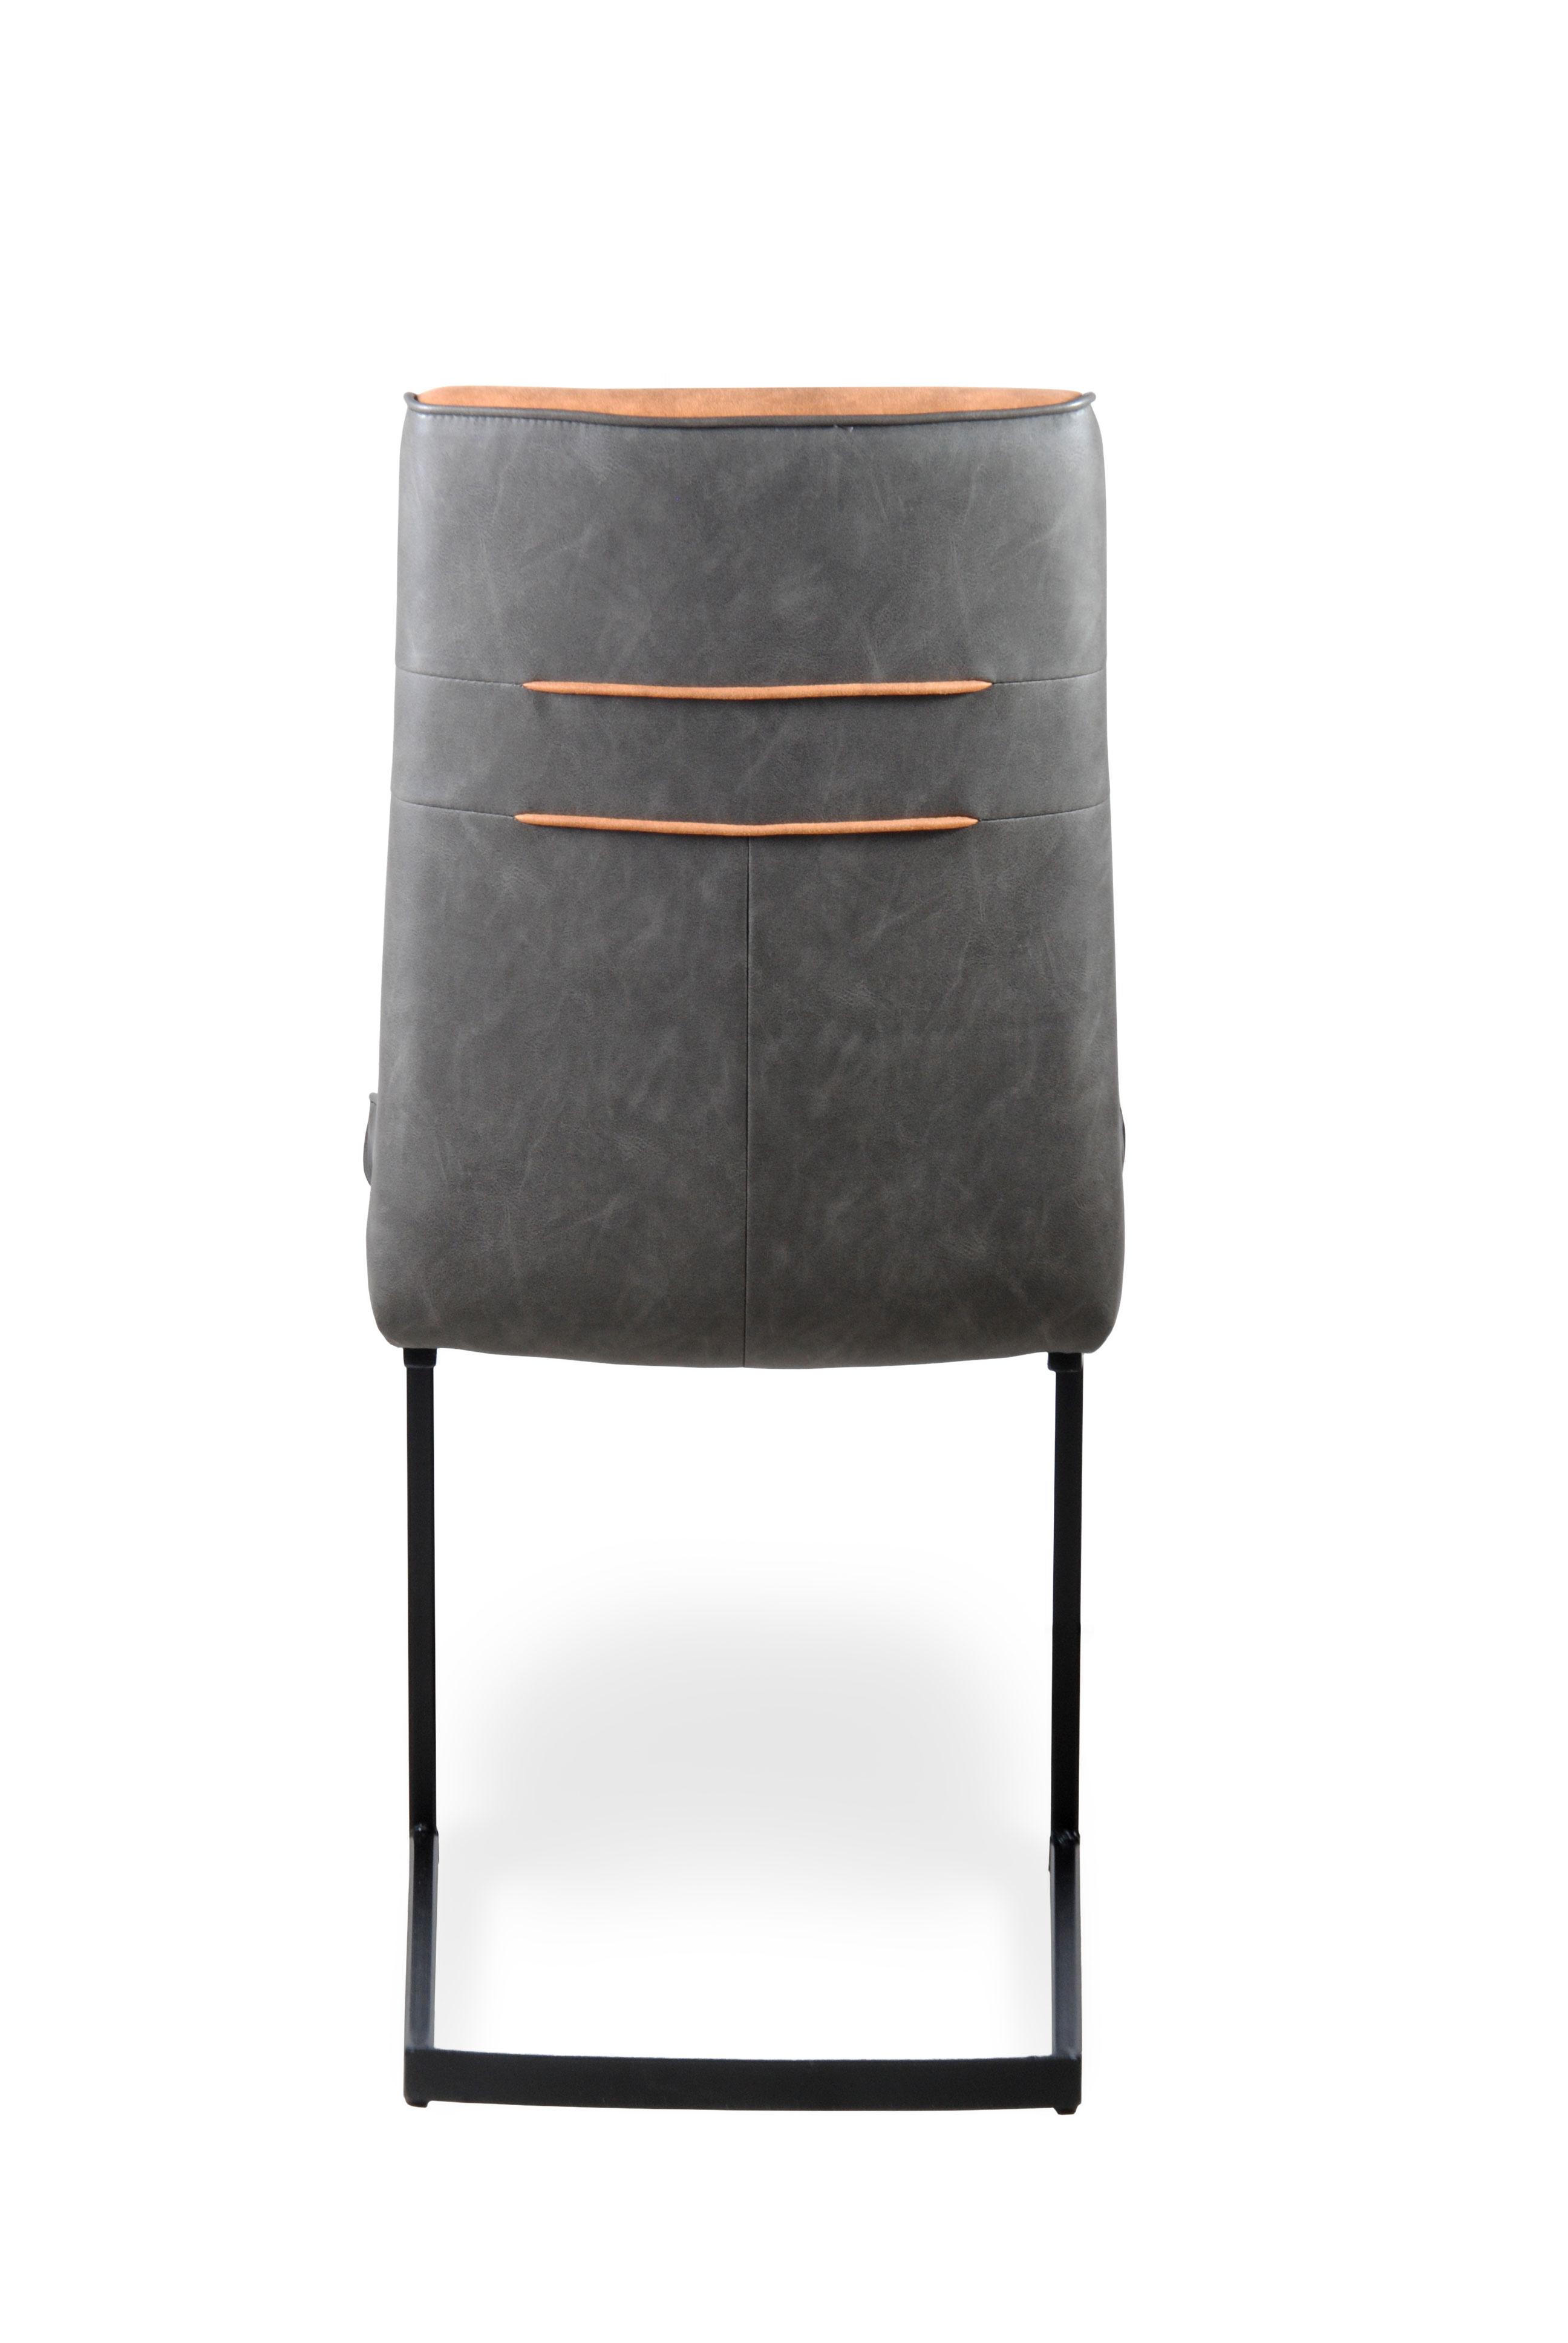 Iron_cover-Preston-24_backrest_Vintage-104_Base-black-(t-m-c)